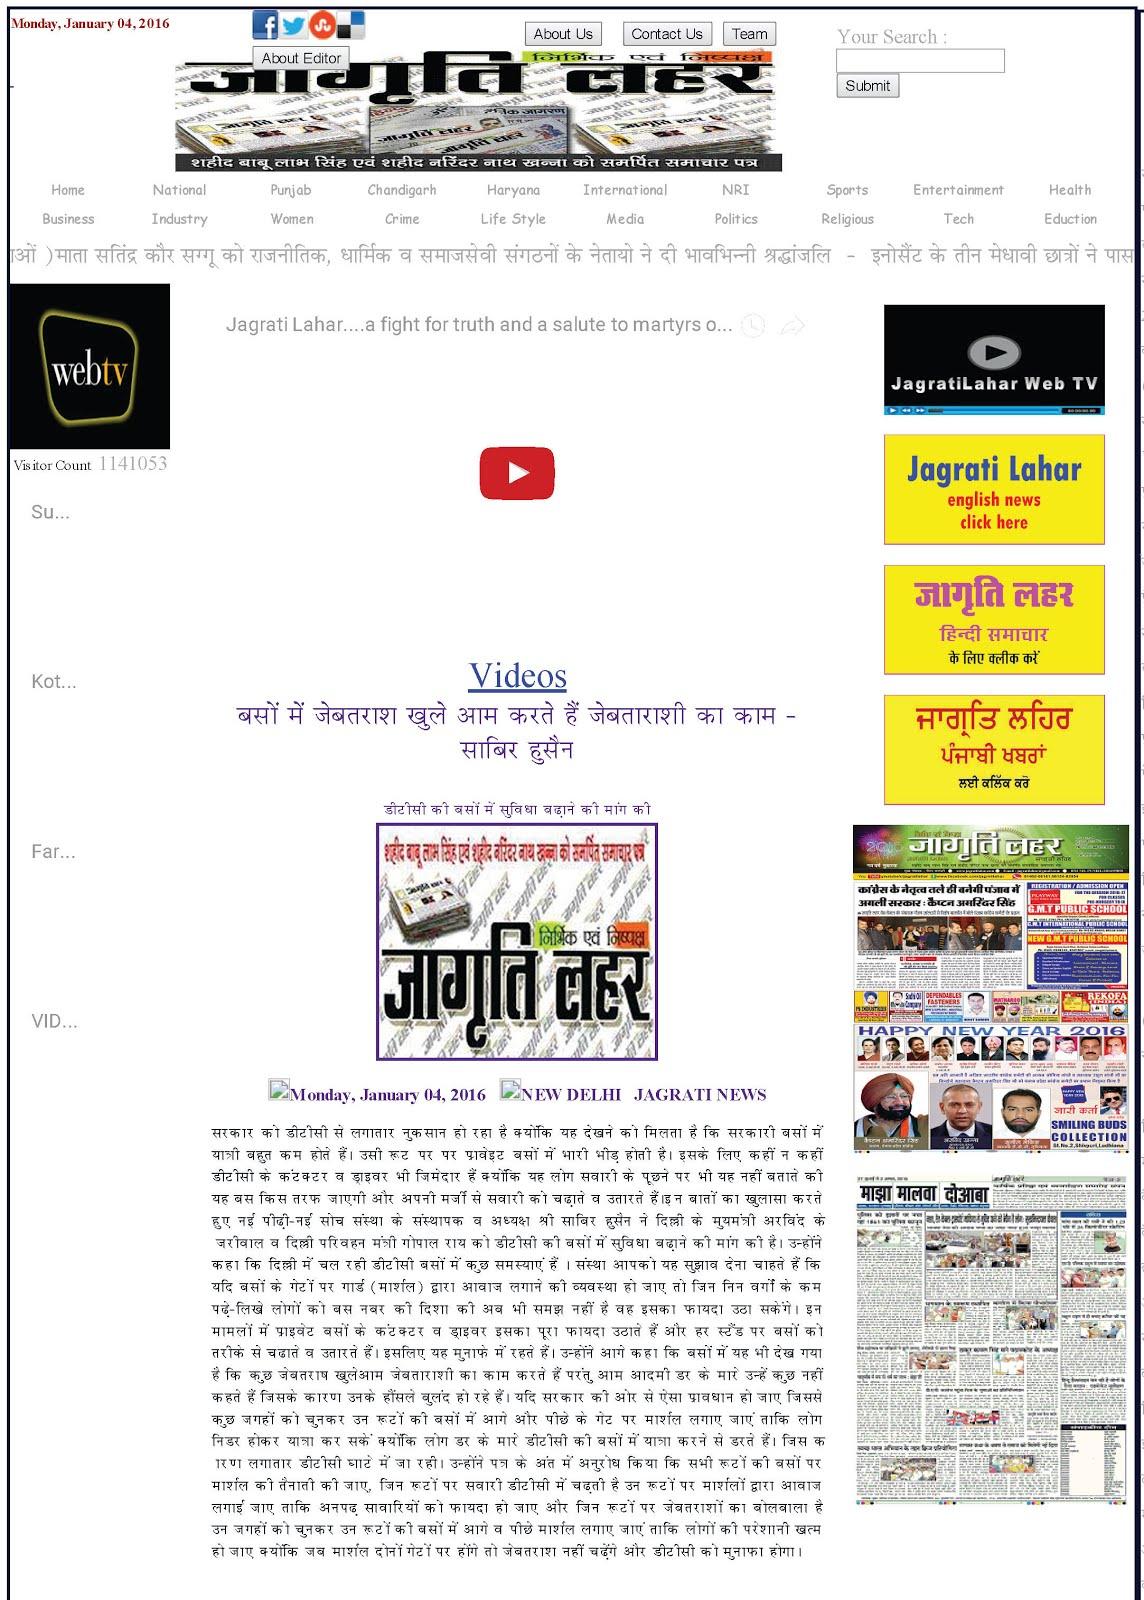 http://jagratilahar.com/HINDI_news_details.asp?id=15065